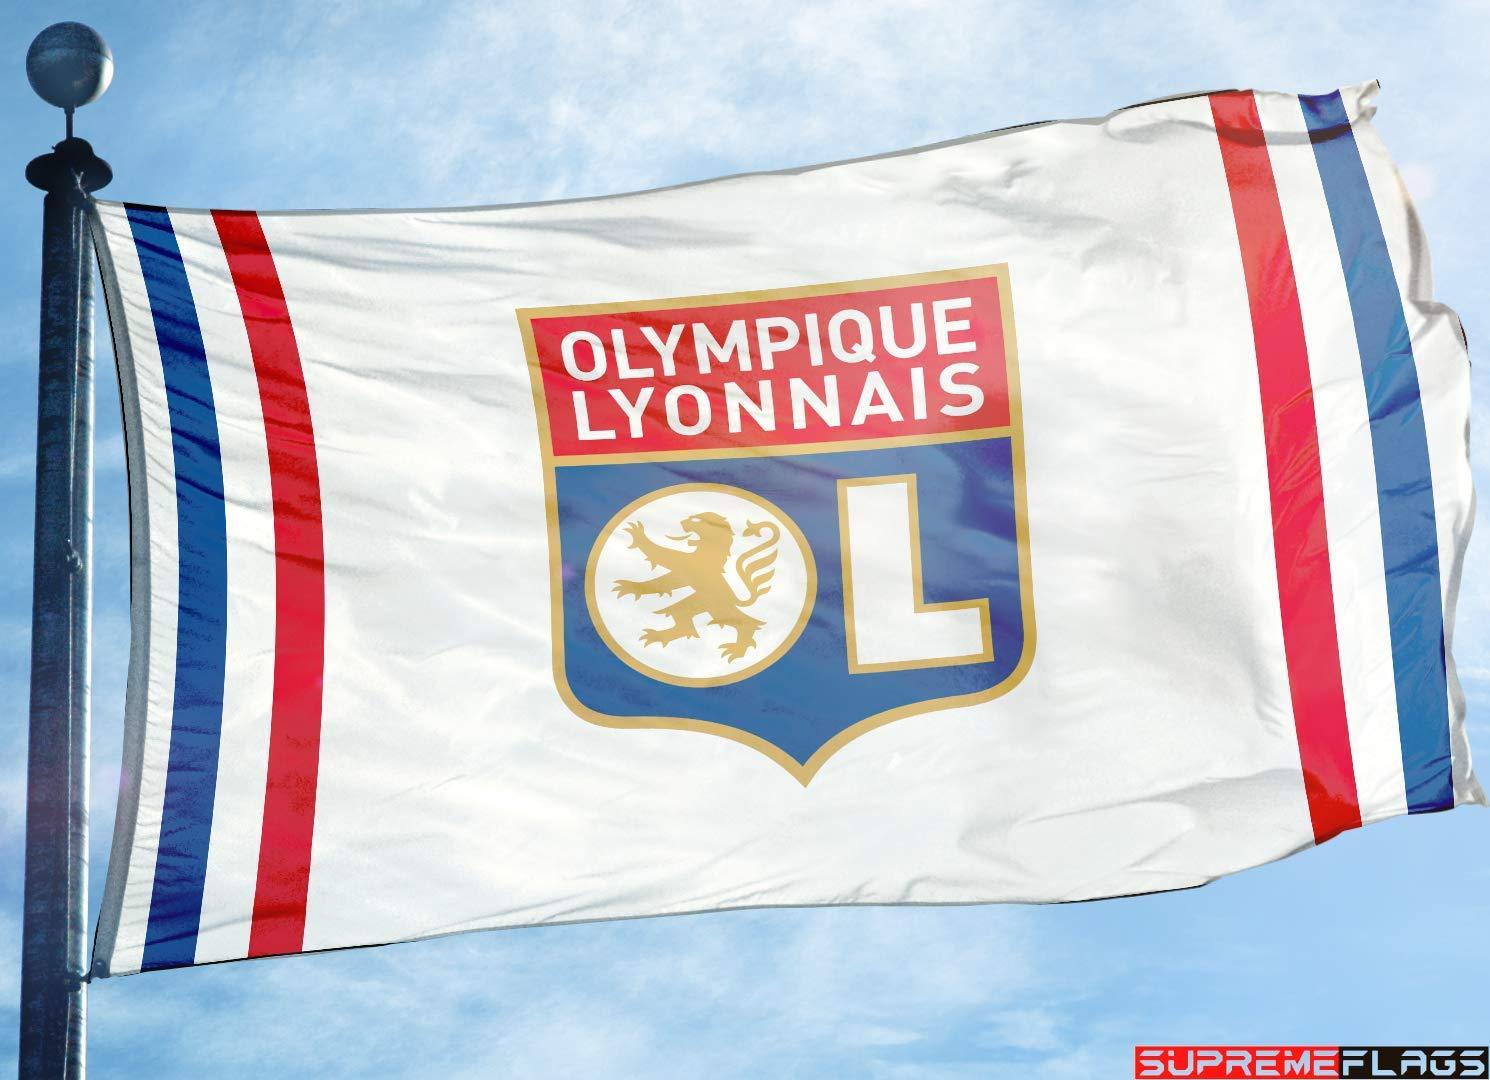 90 x 150 cm White Lyonnais France Football Soccer Drapeau Olympique Lyon Flag Banner